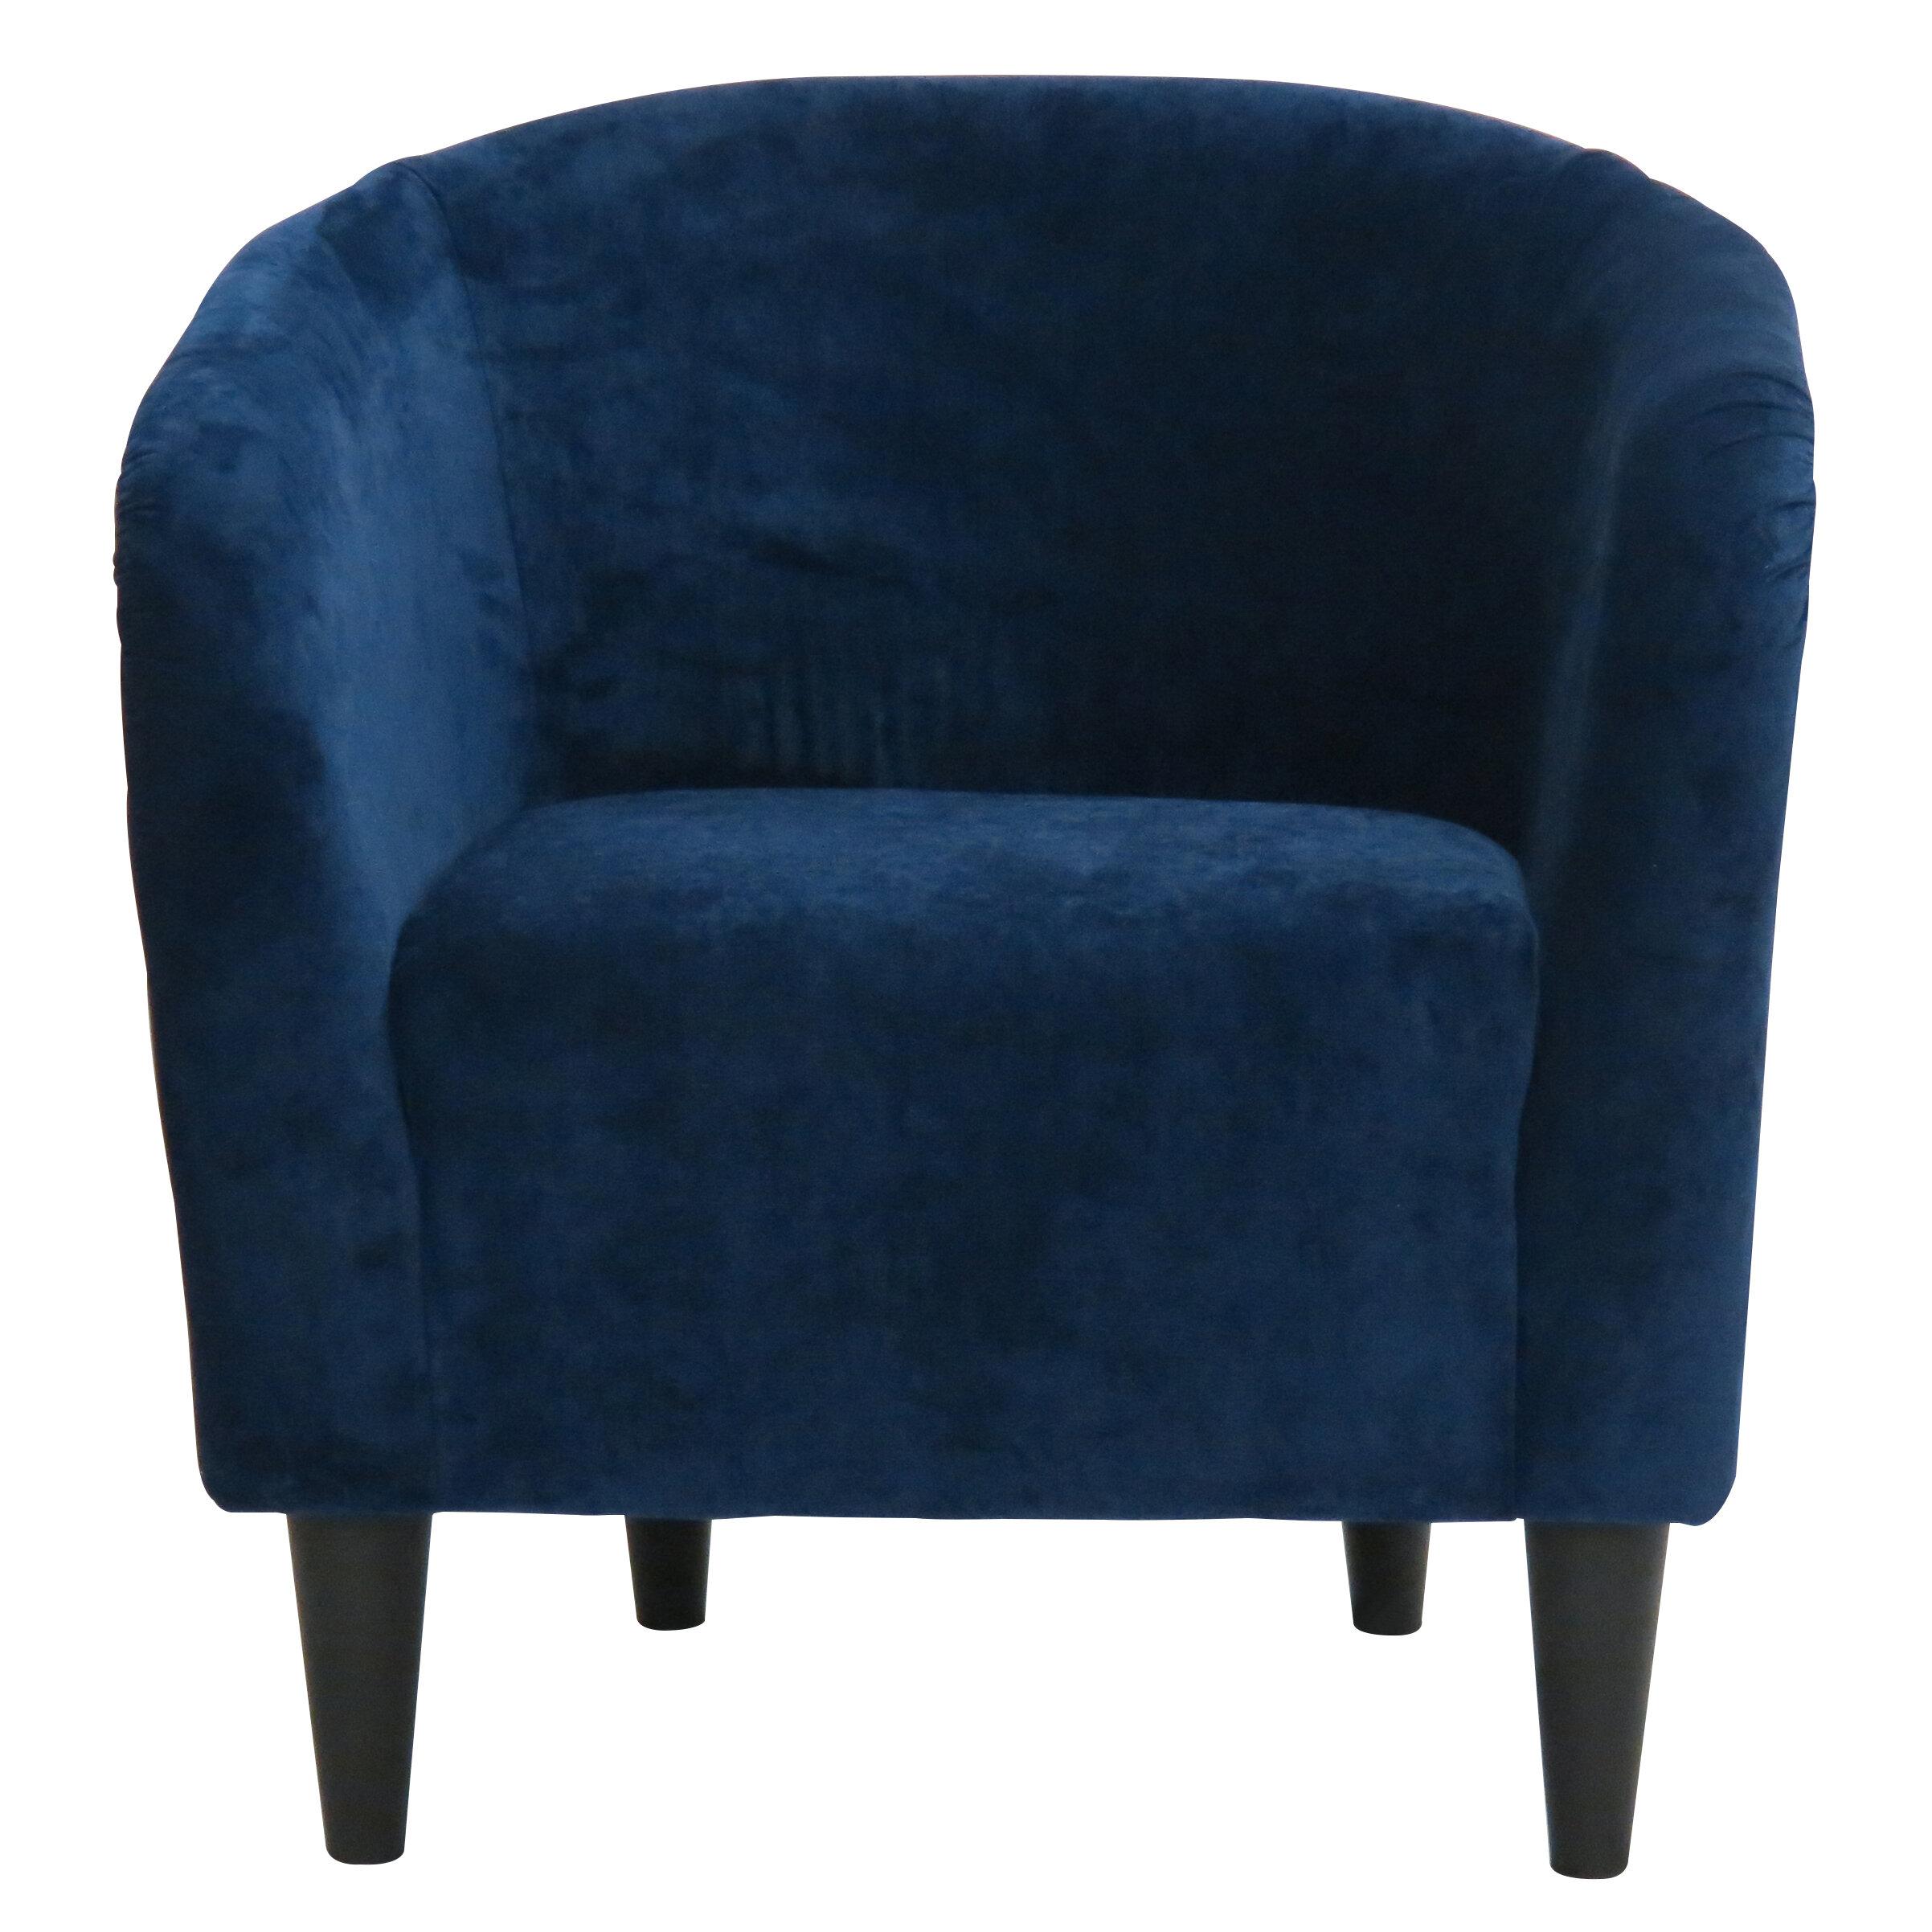 Willa Arlo Interiors Sabio Barrel Chair U0026 Reviews   Wayfair